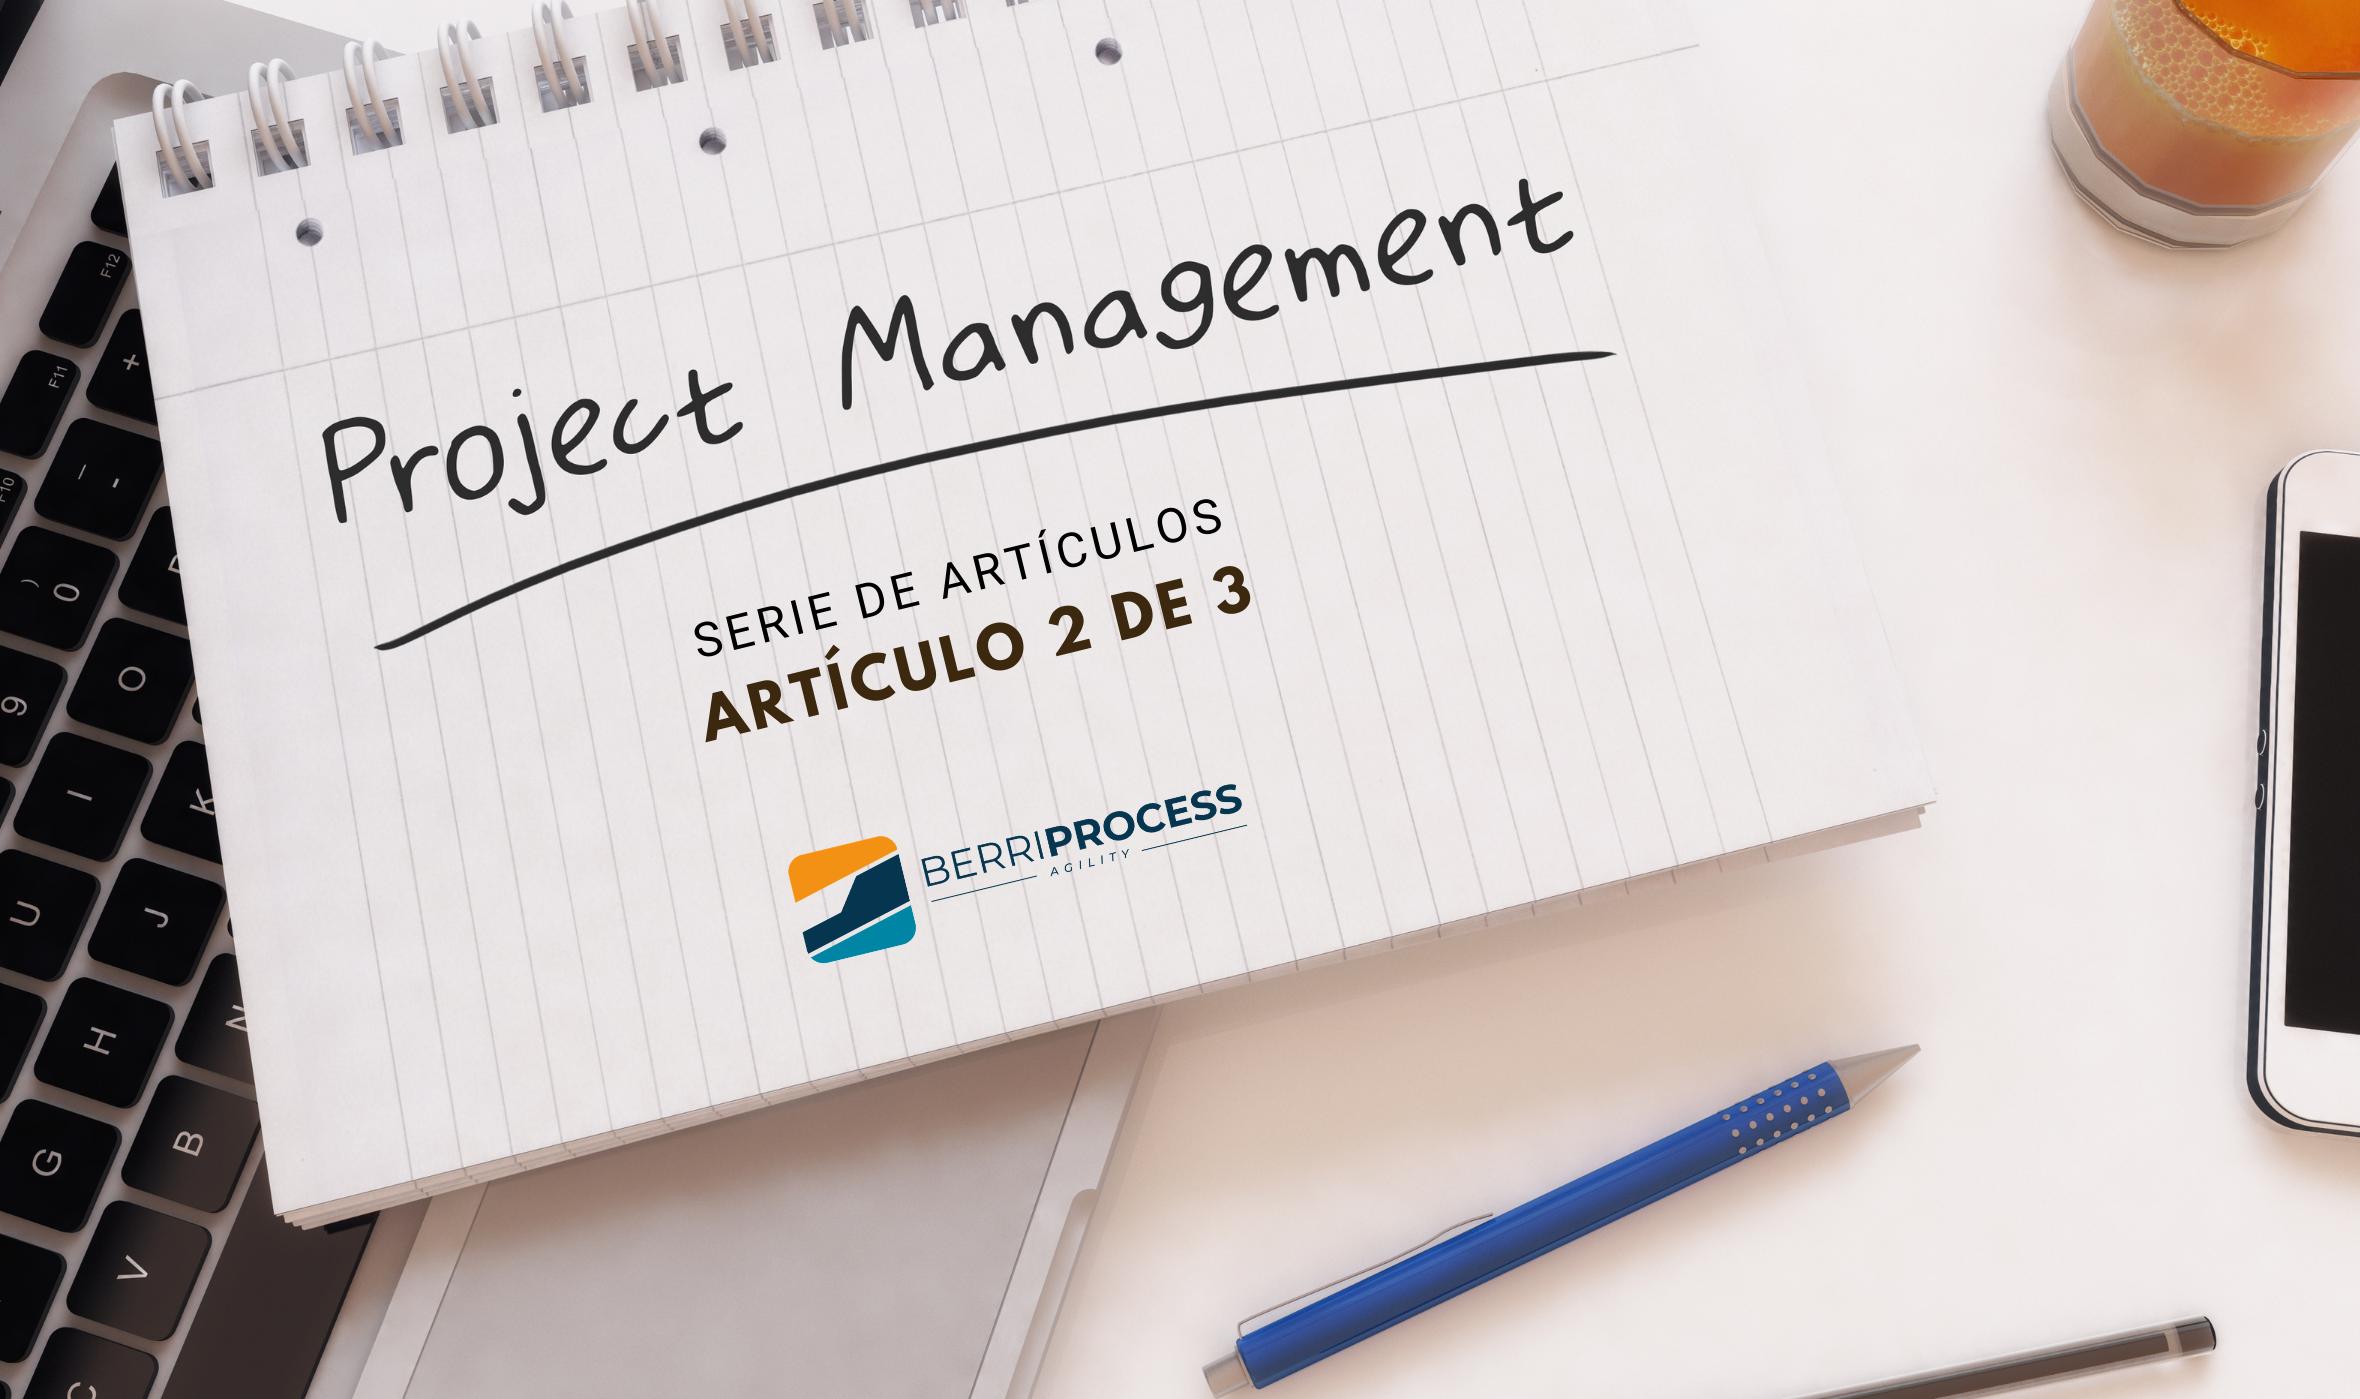 Imagen Post Project Management 2/3 serie de artículos